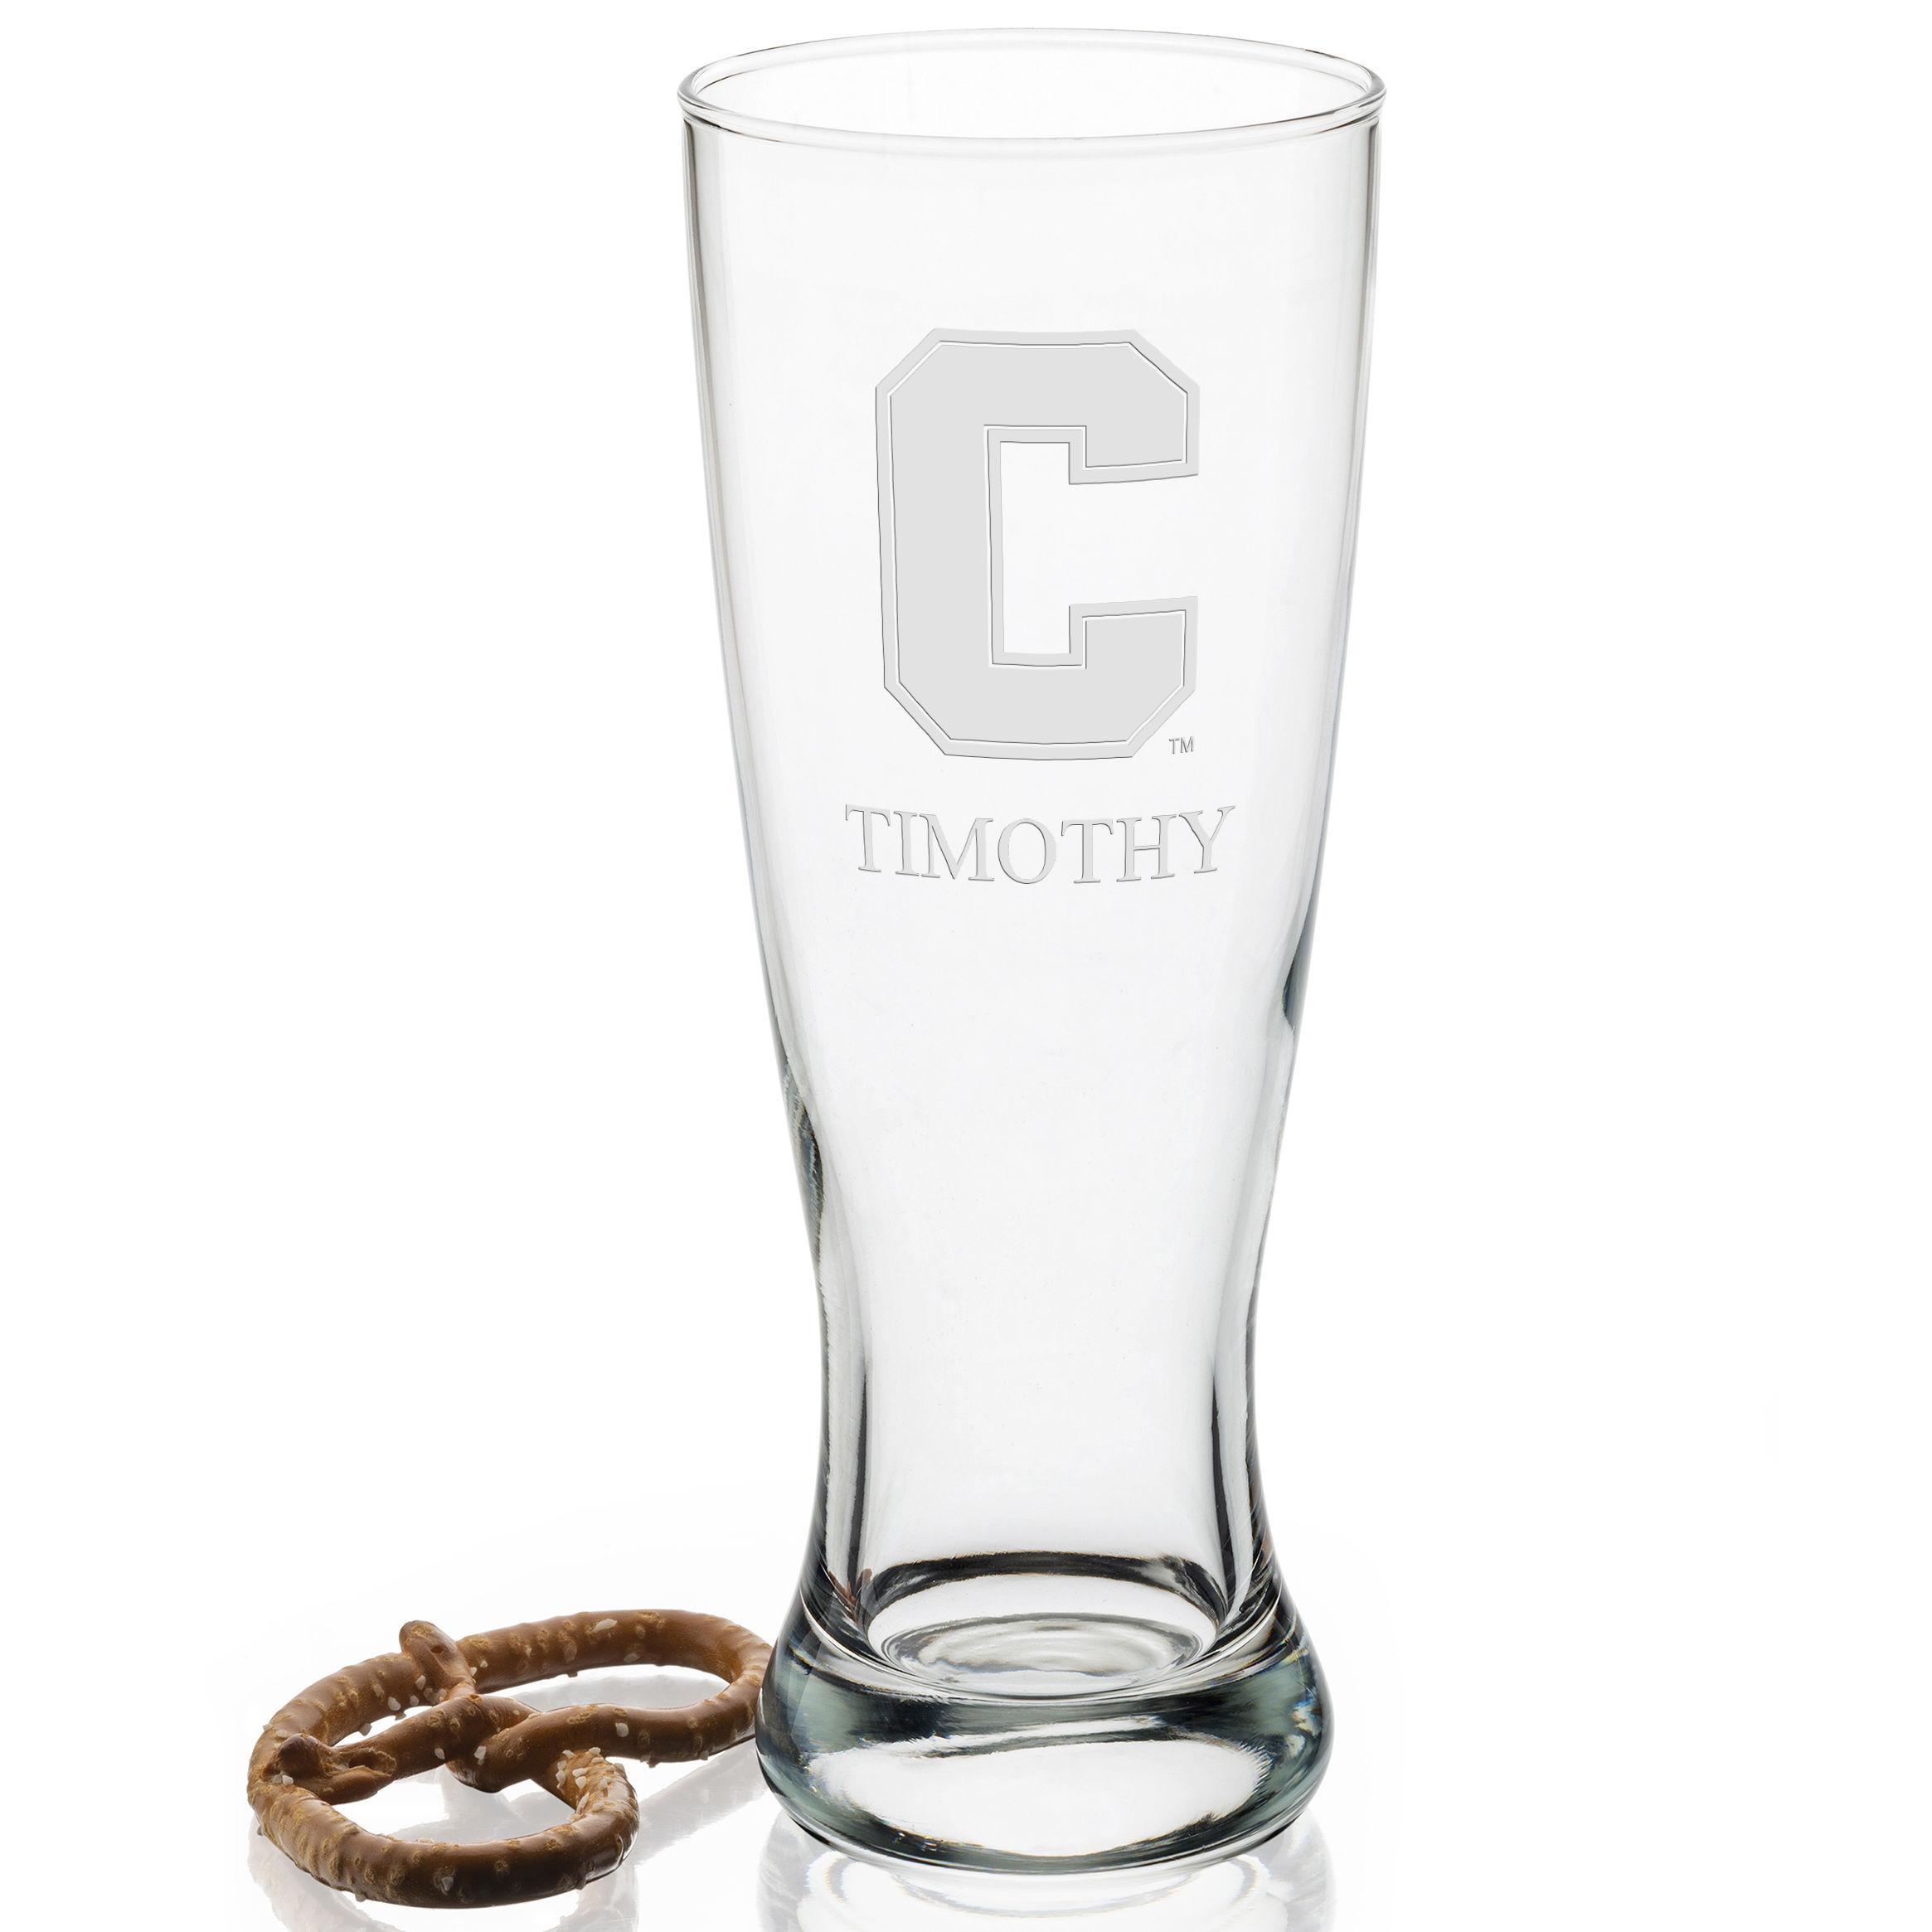 Cornell 20oz Pilsner Glasses - Set of 2 - Image 2